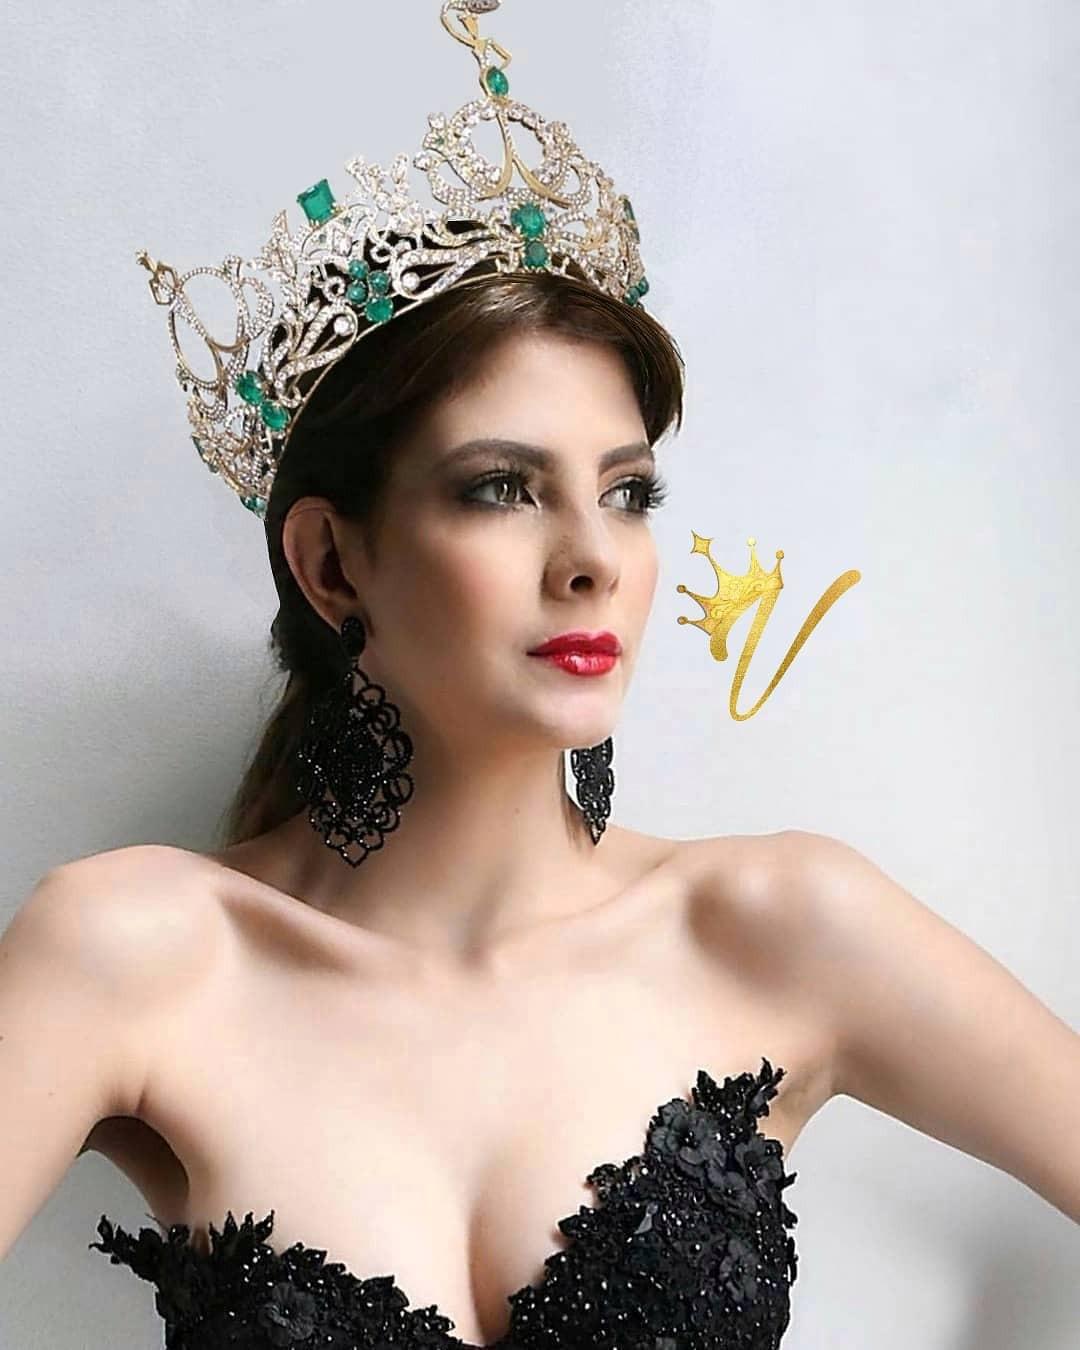 natalia manrique, miss grand colombia 2020. - Página 4 Qj3ycx10